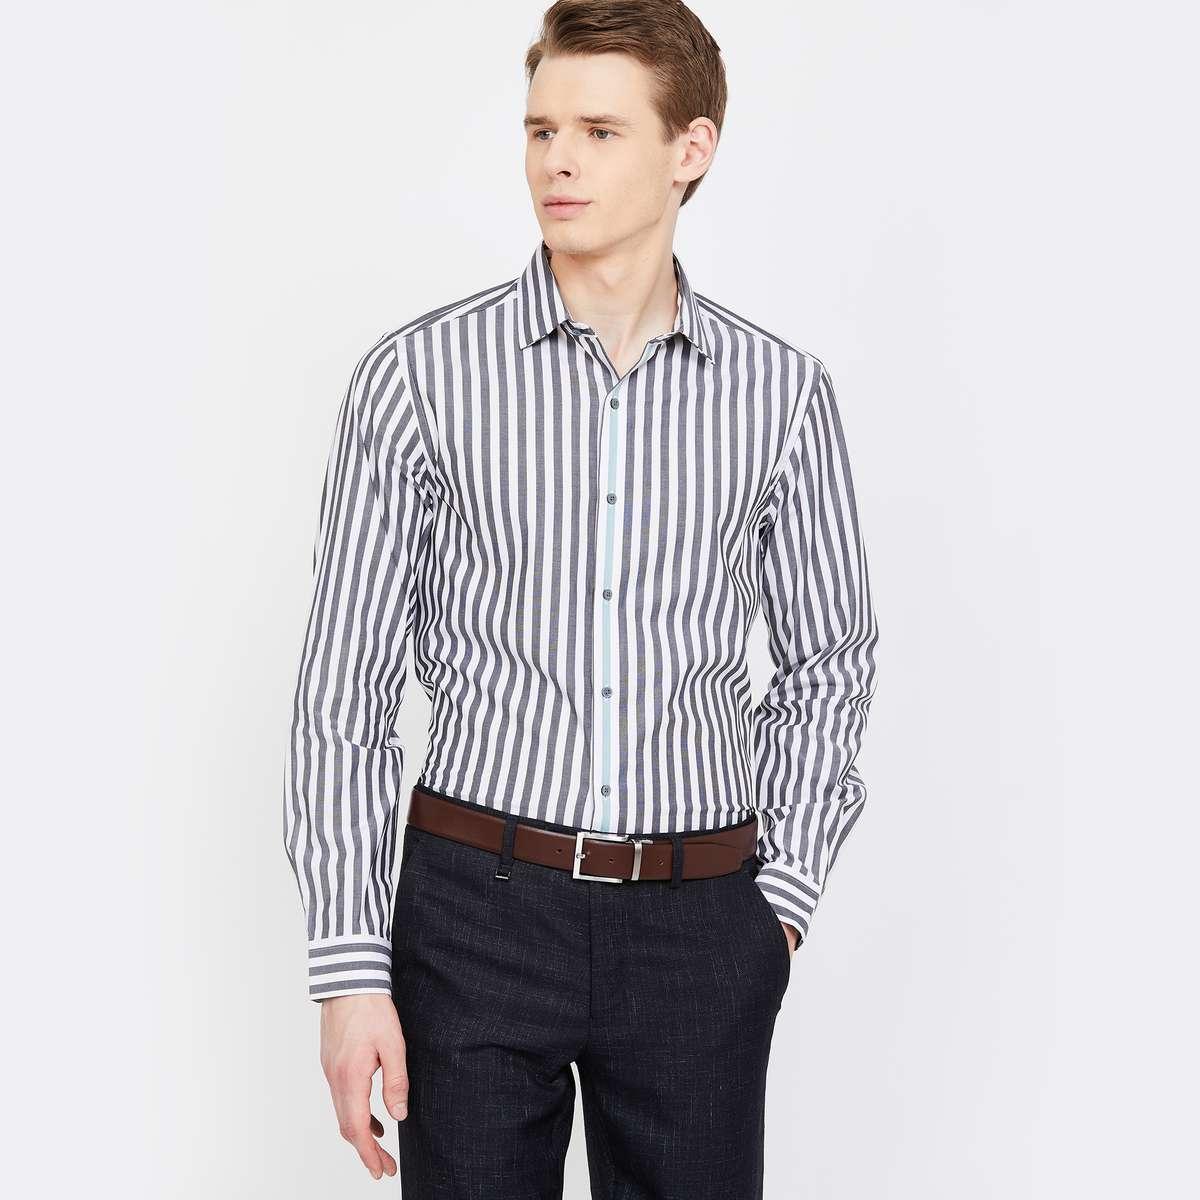 ARROW NEW YORK Striped Super Slim Fit Formal Shirt